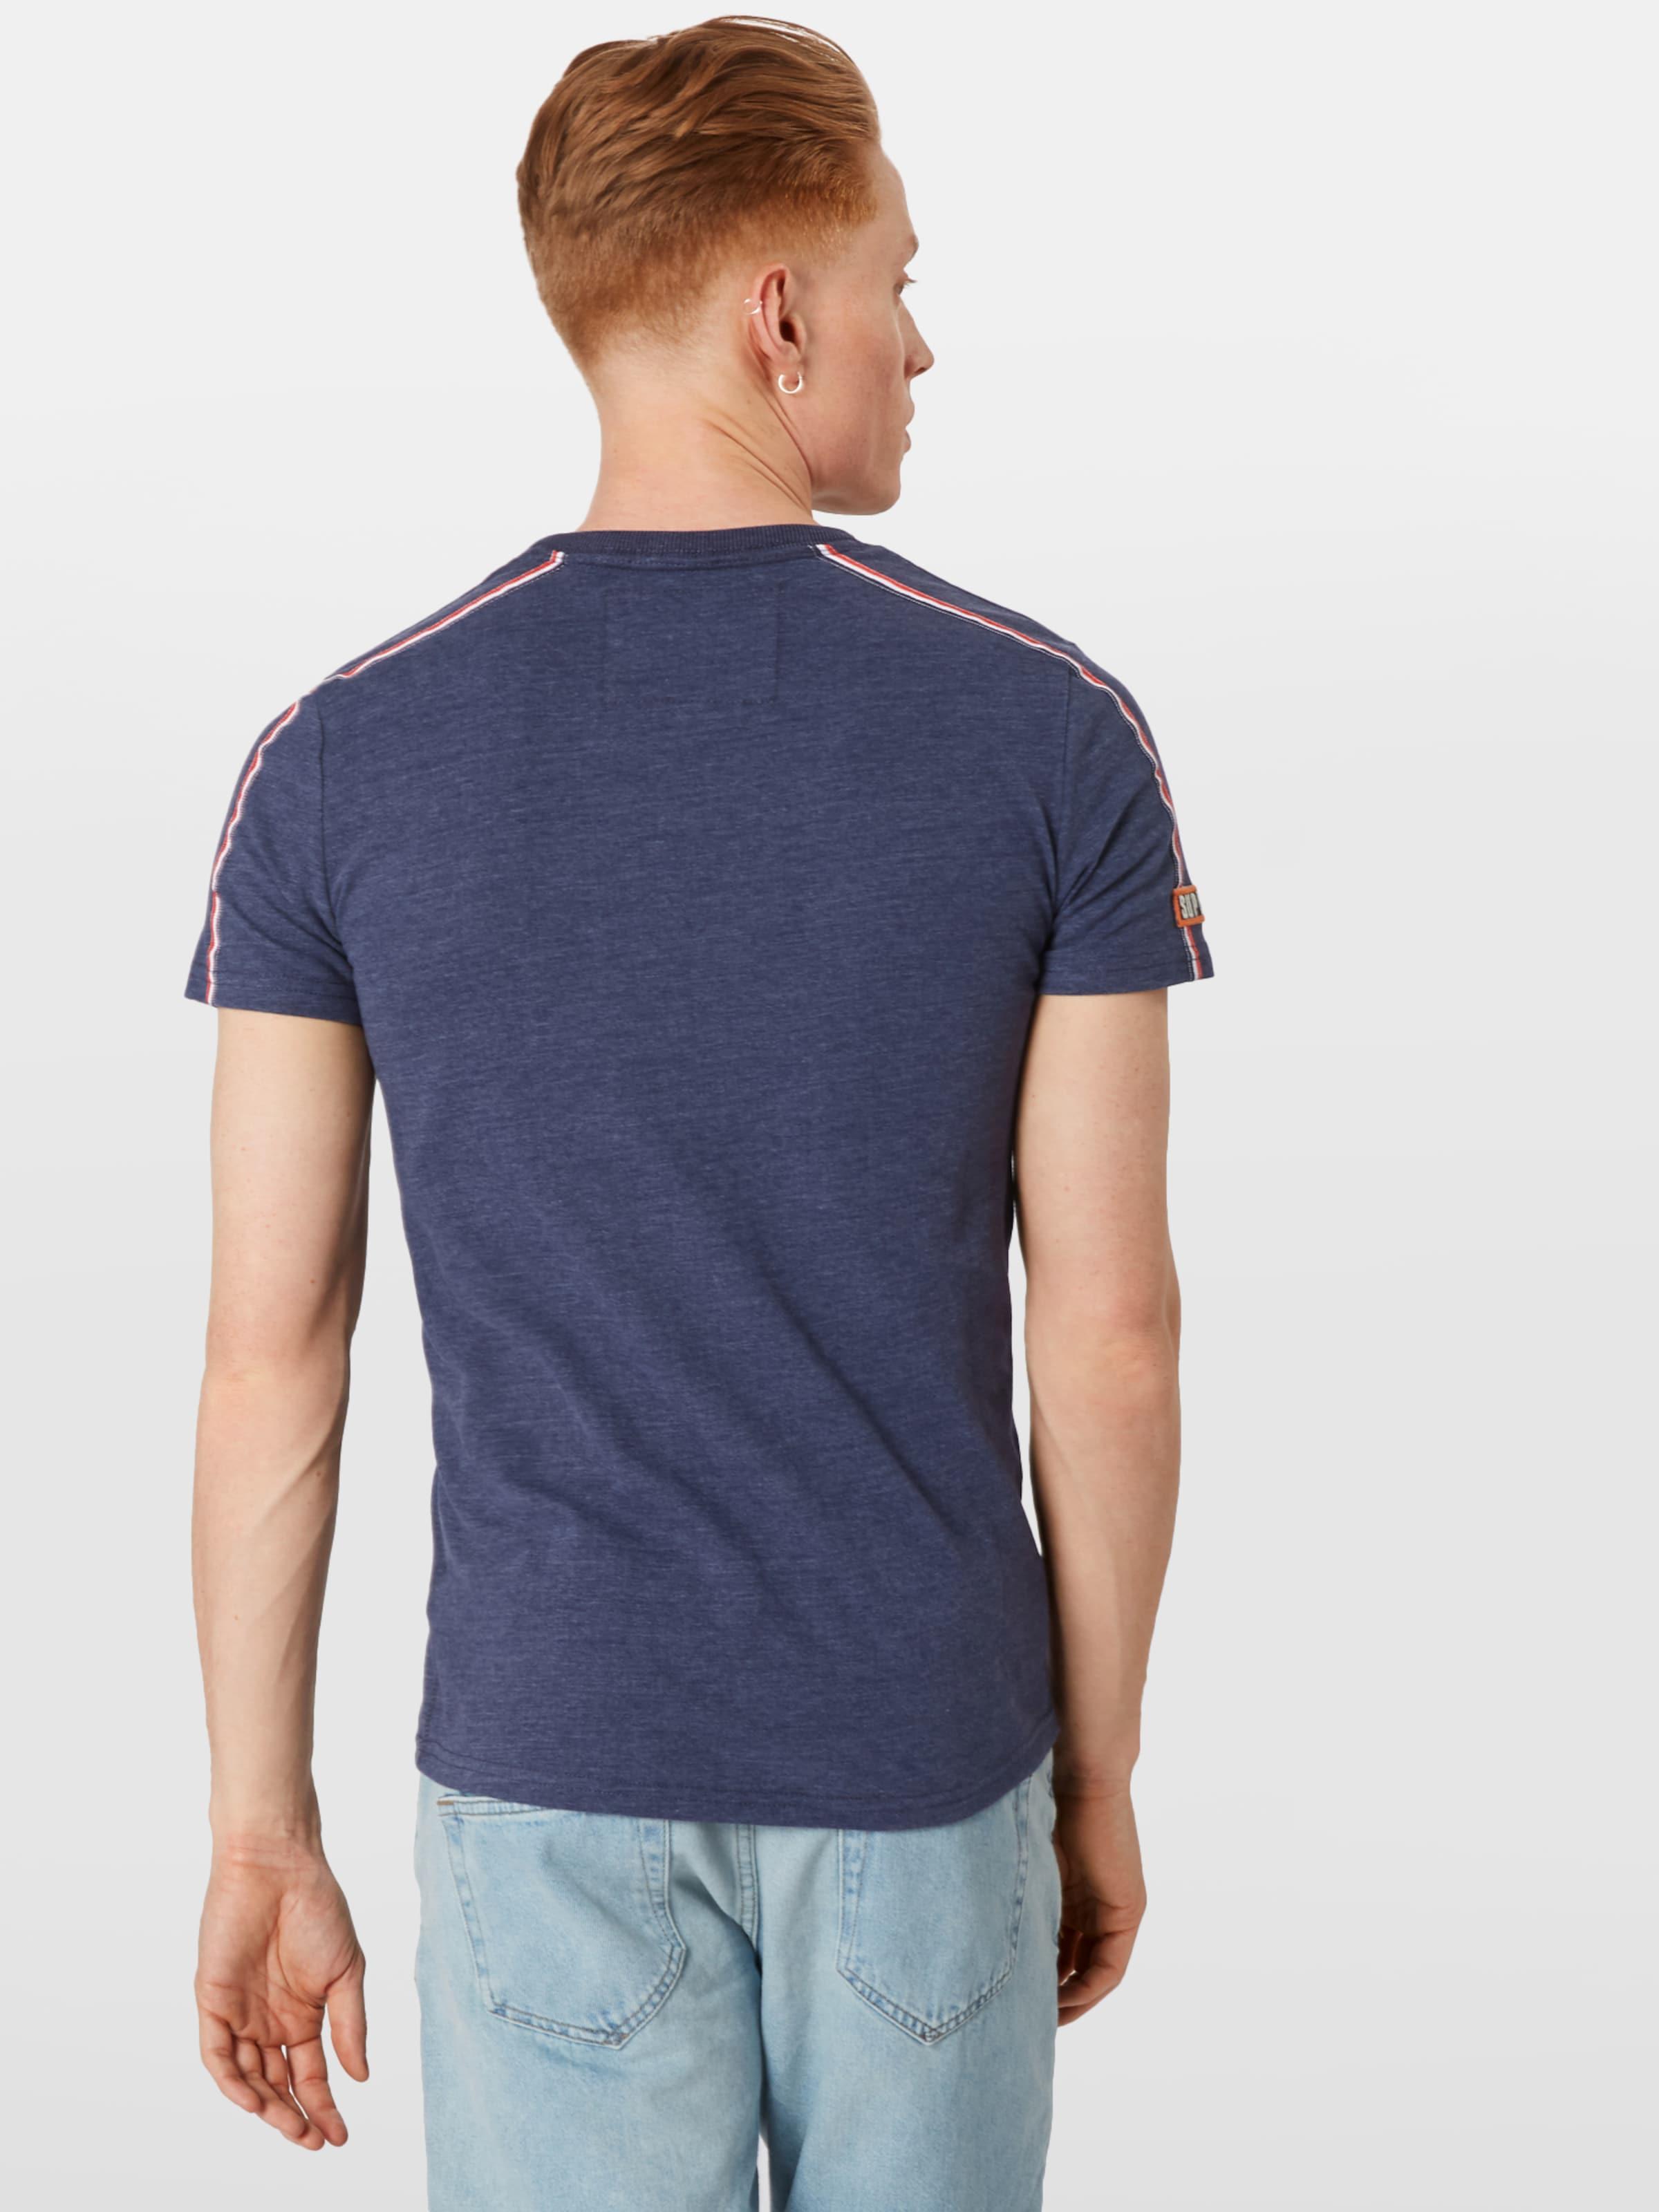 shirt 'custom Classics En Superdry T BleuBlanc Tee' dWroCxBe